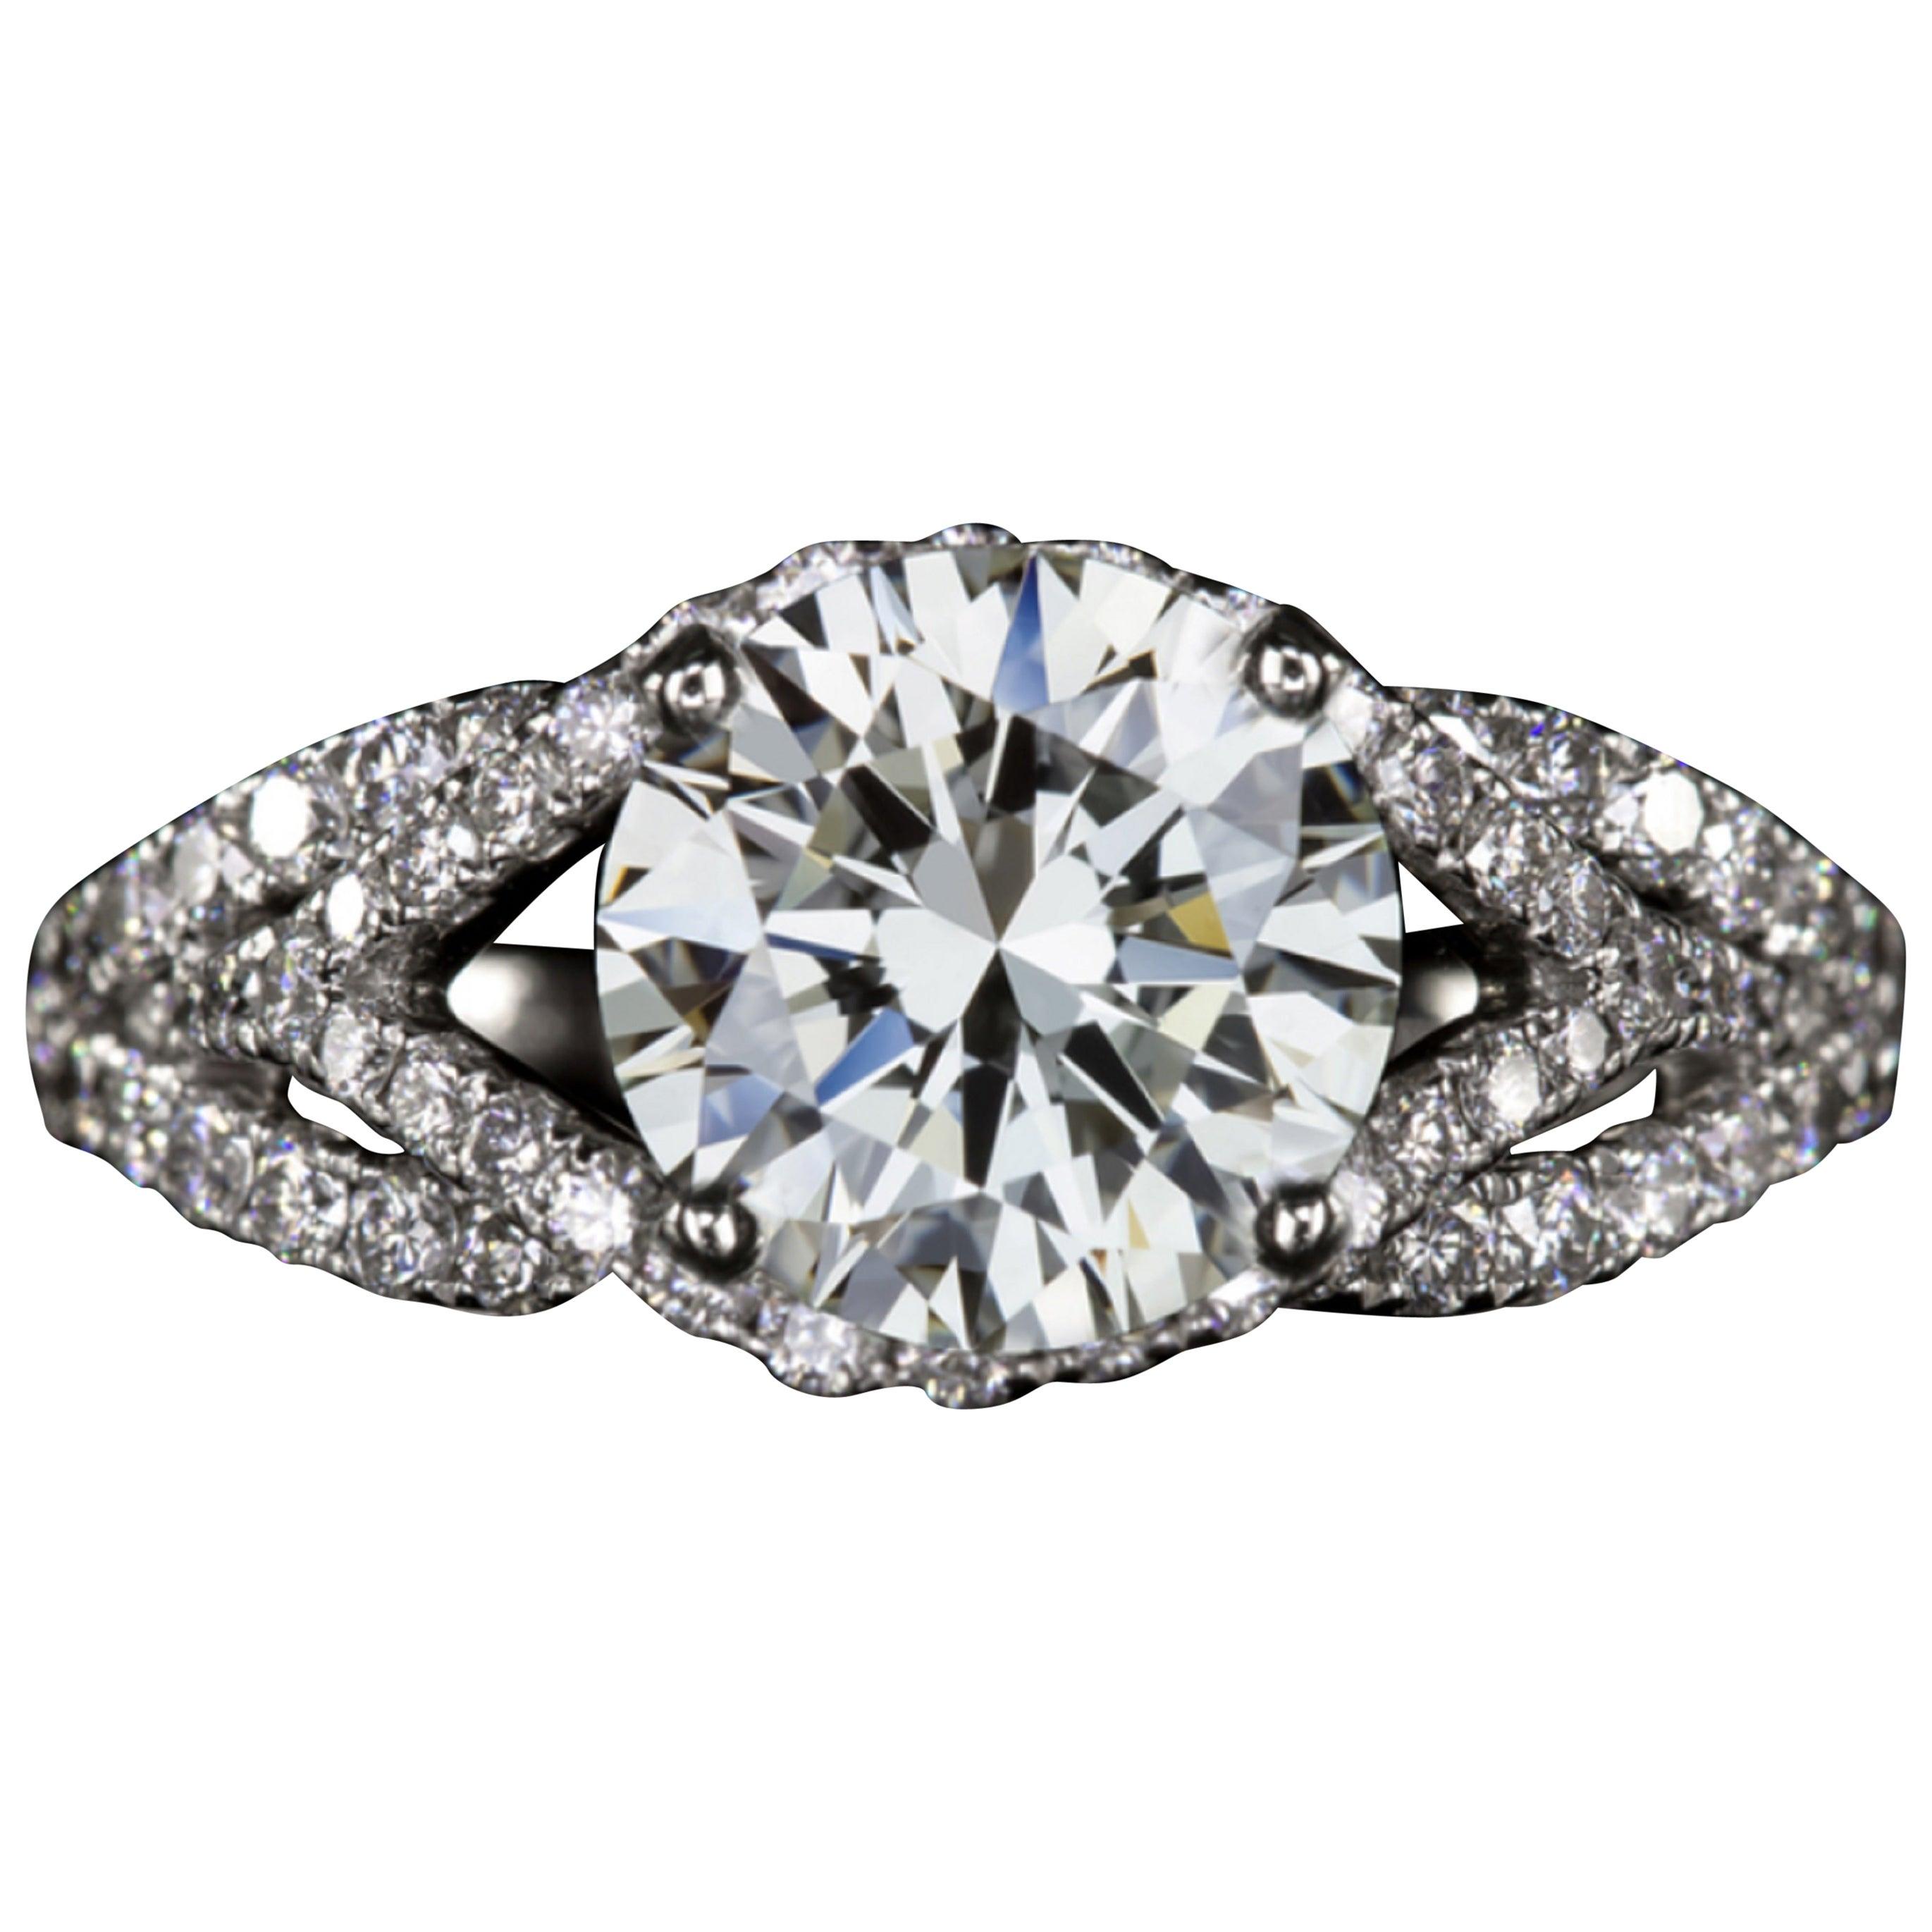 GIA Certified 3 Carat Round Brilliant Cut Diamond Ring